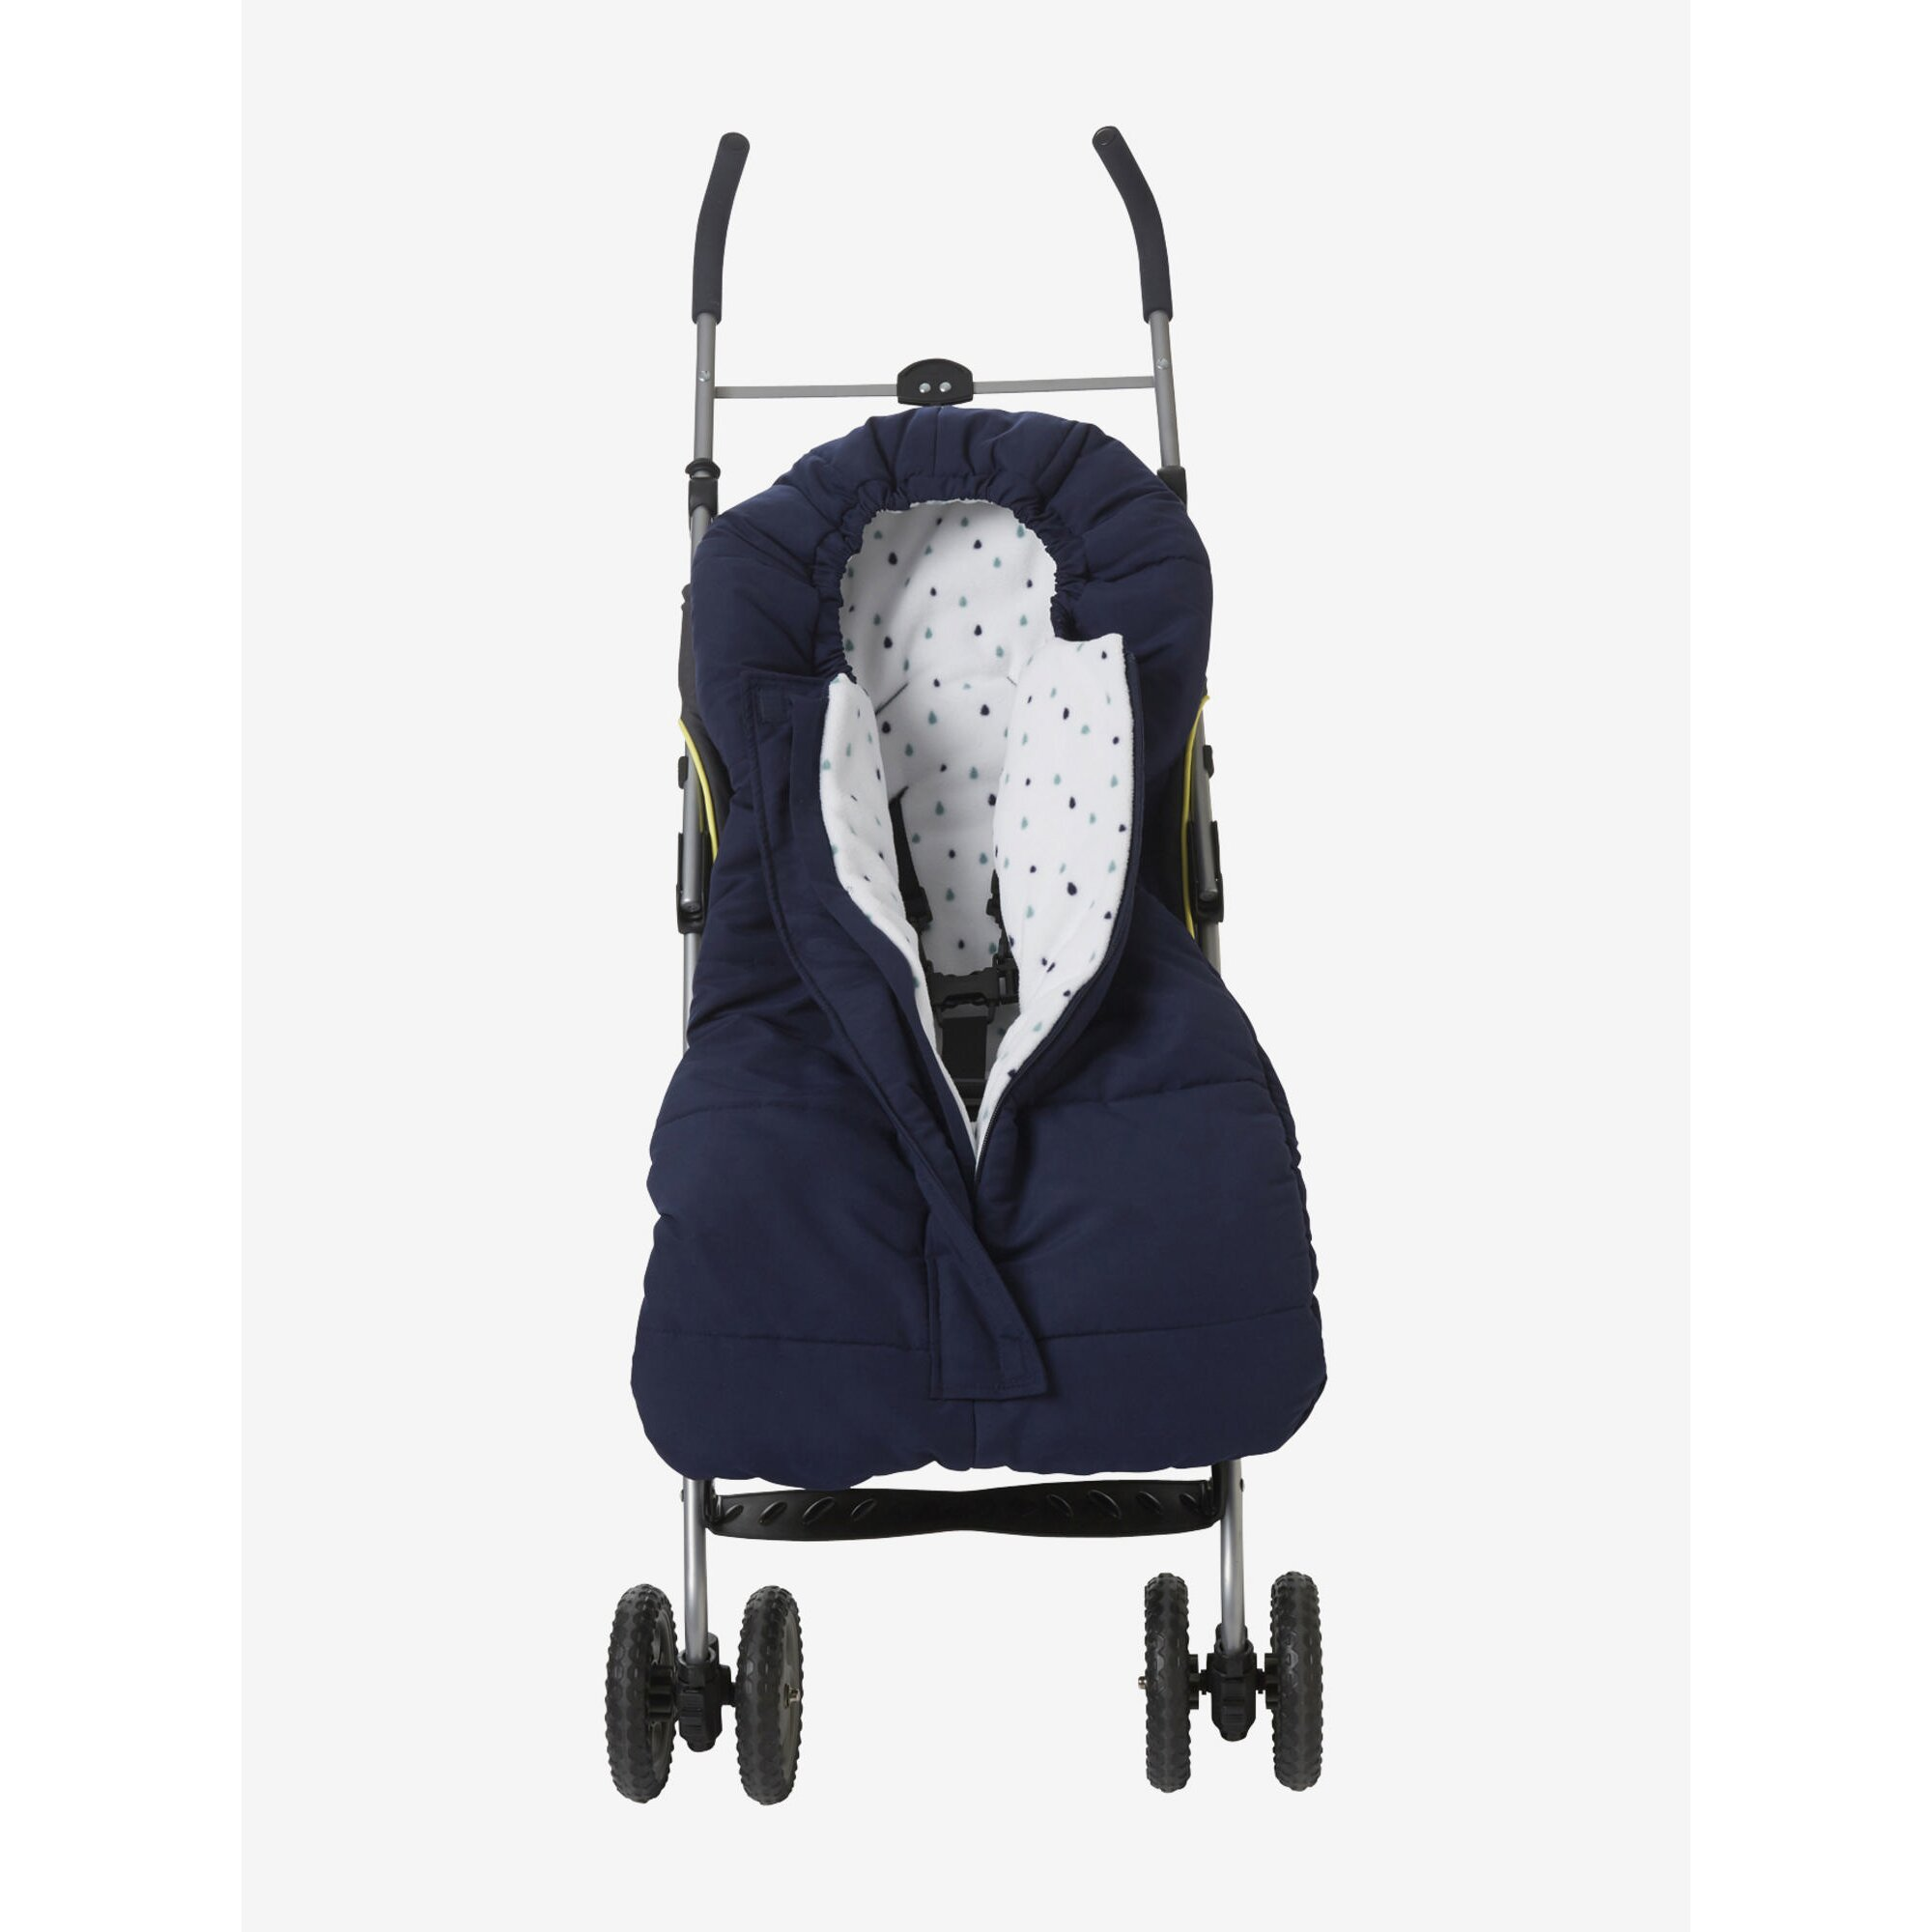 Vertbaudet Baby Fußsack, wetterfest blau